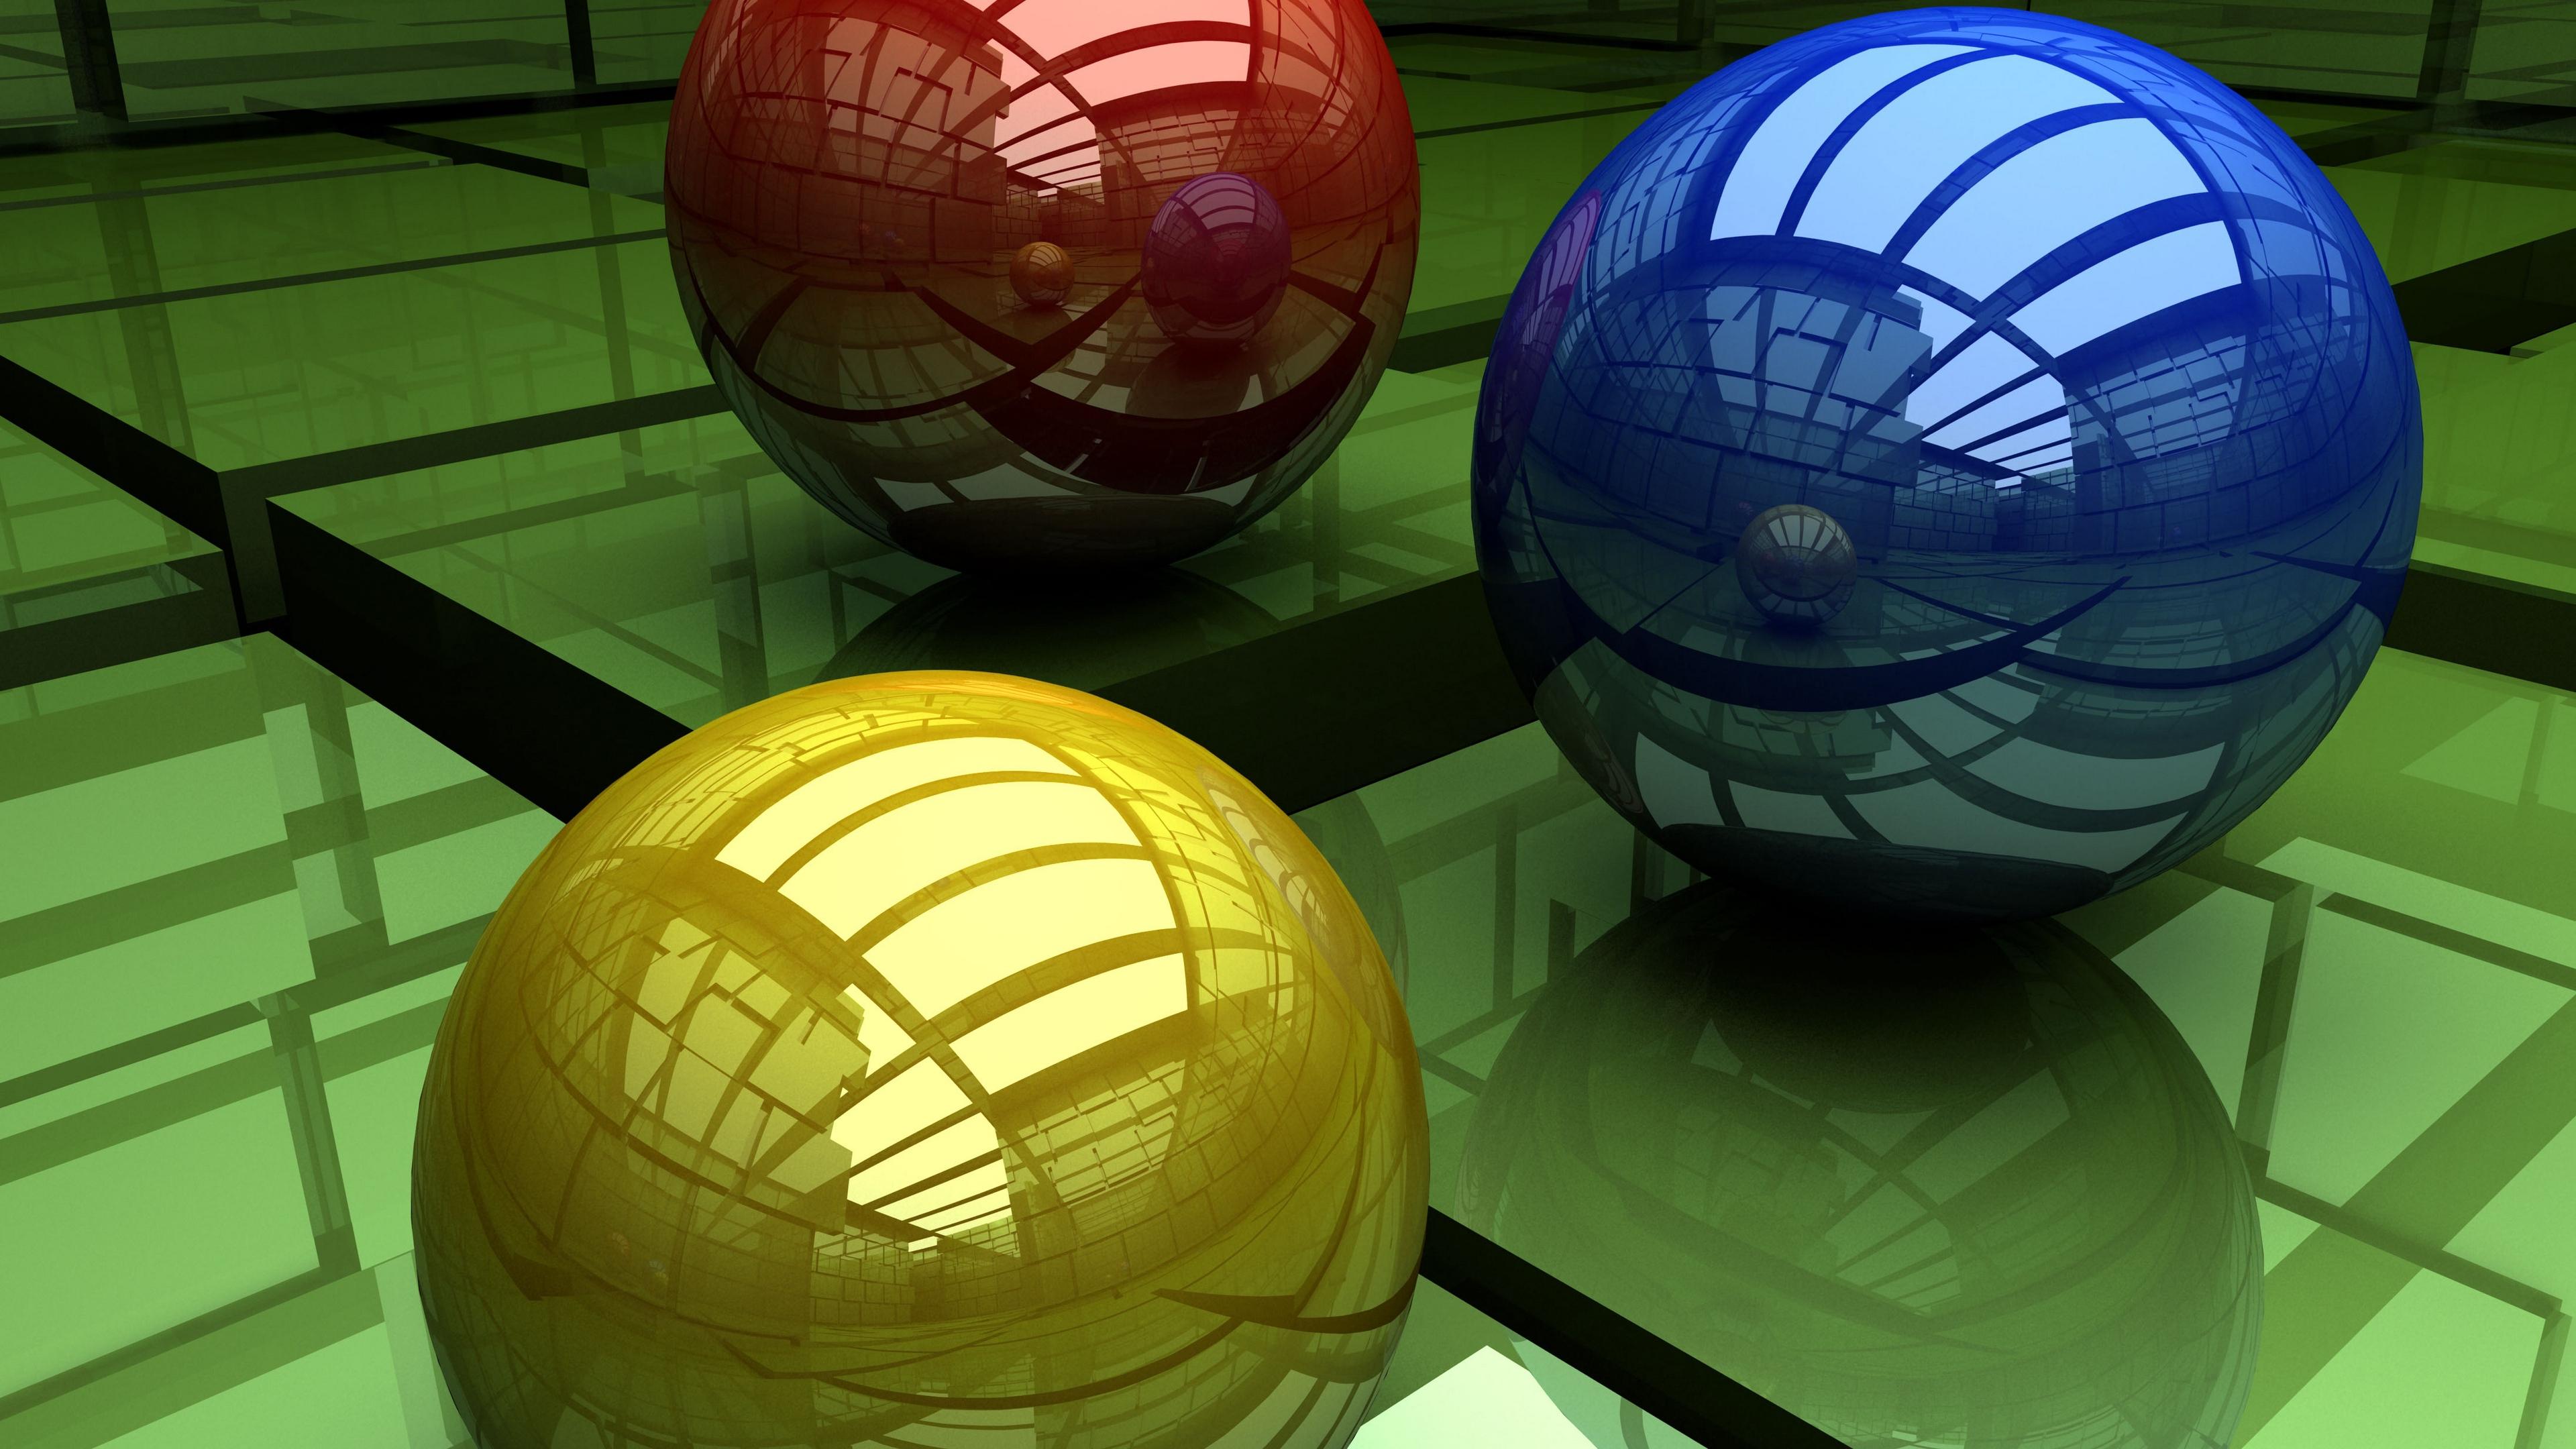 balls three colored surface cubic 4k 1536854838 - balls, three-colored, surface, cubic 4k - three-colored, Surface, Balls